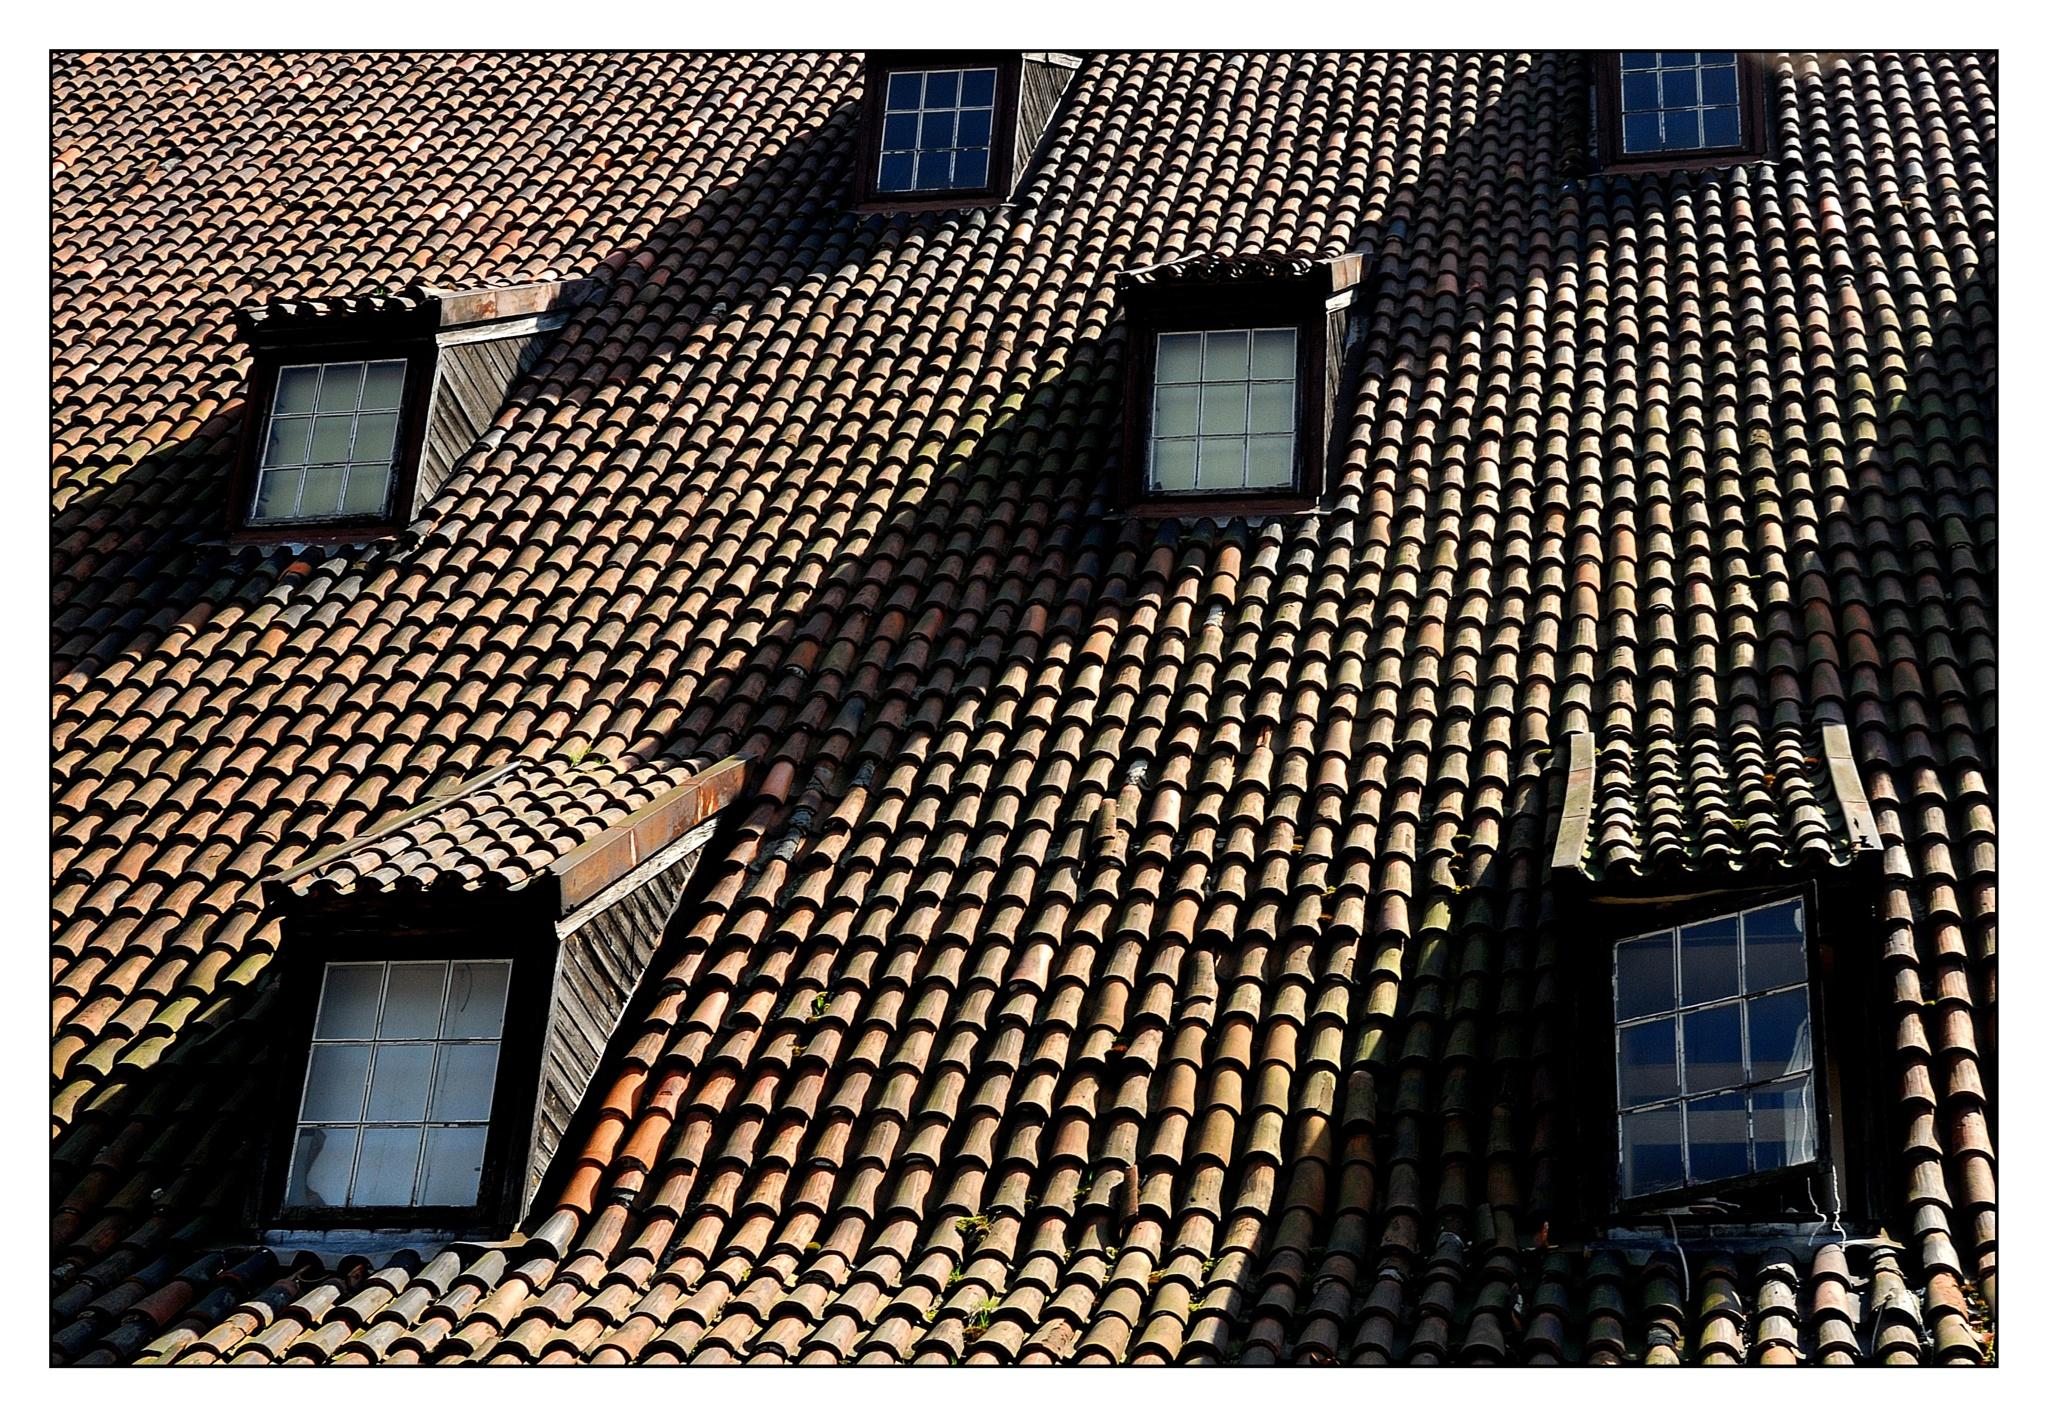 Roof by karlbertil